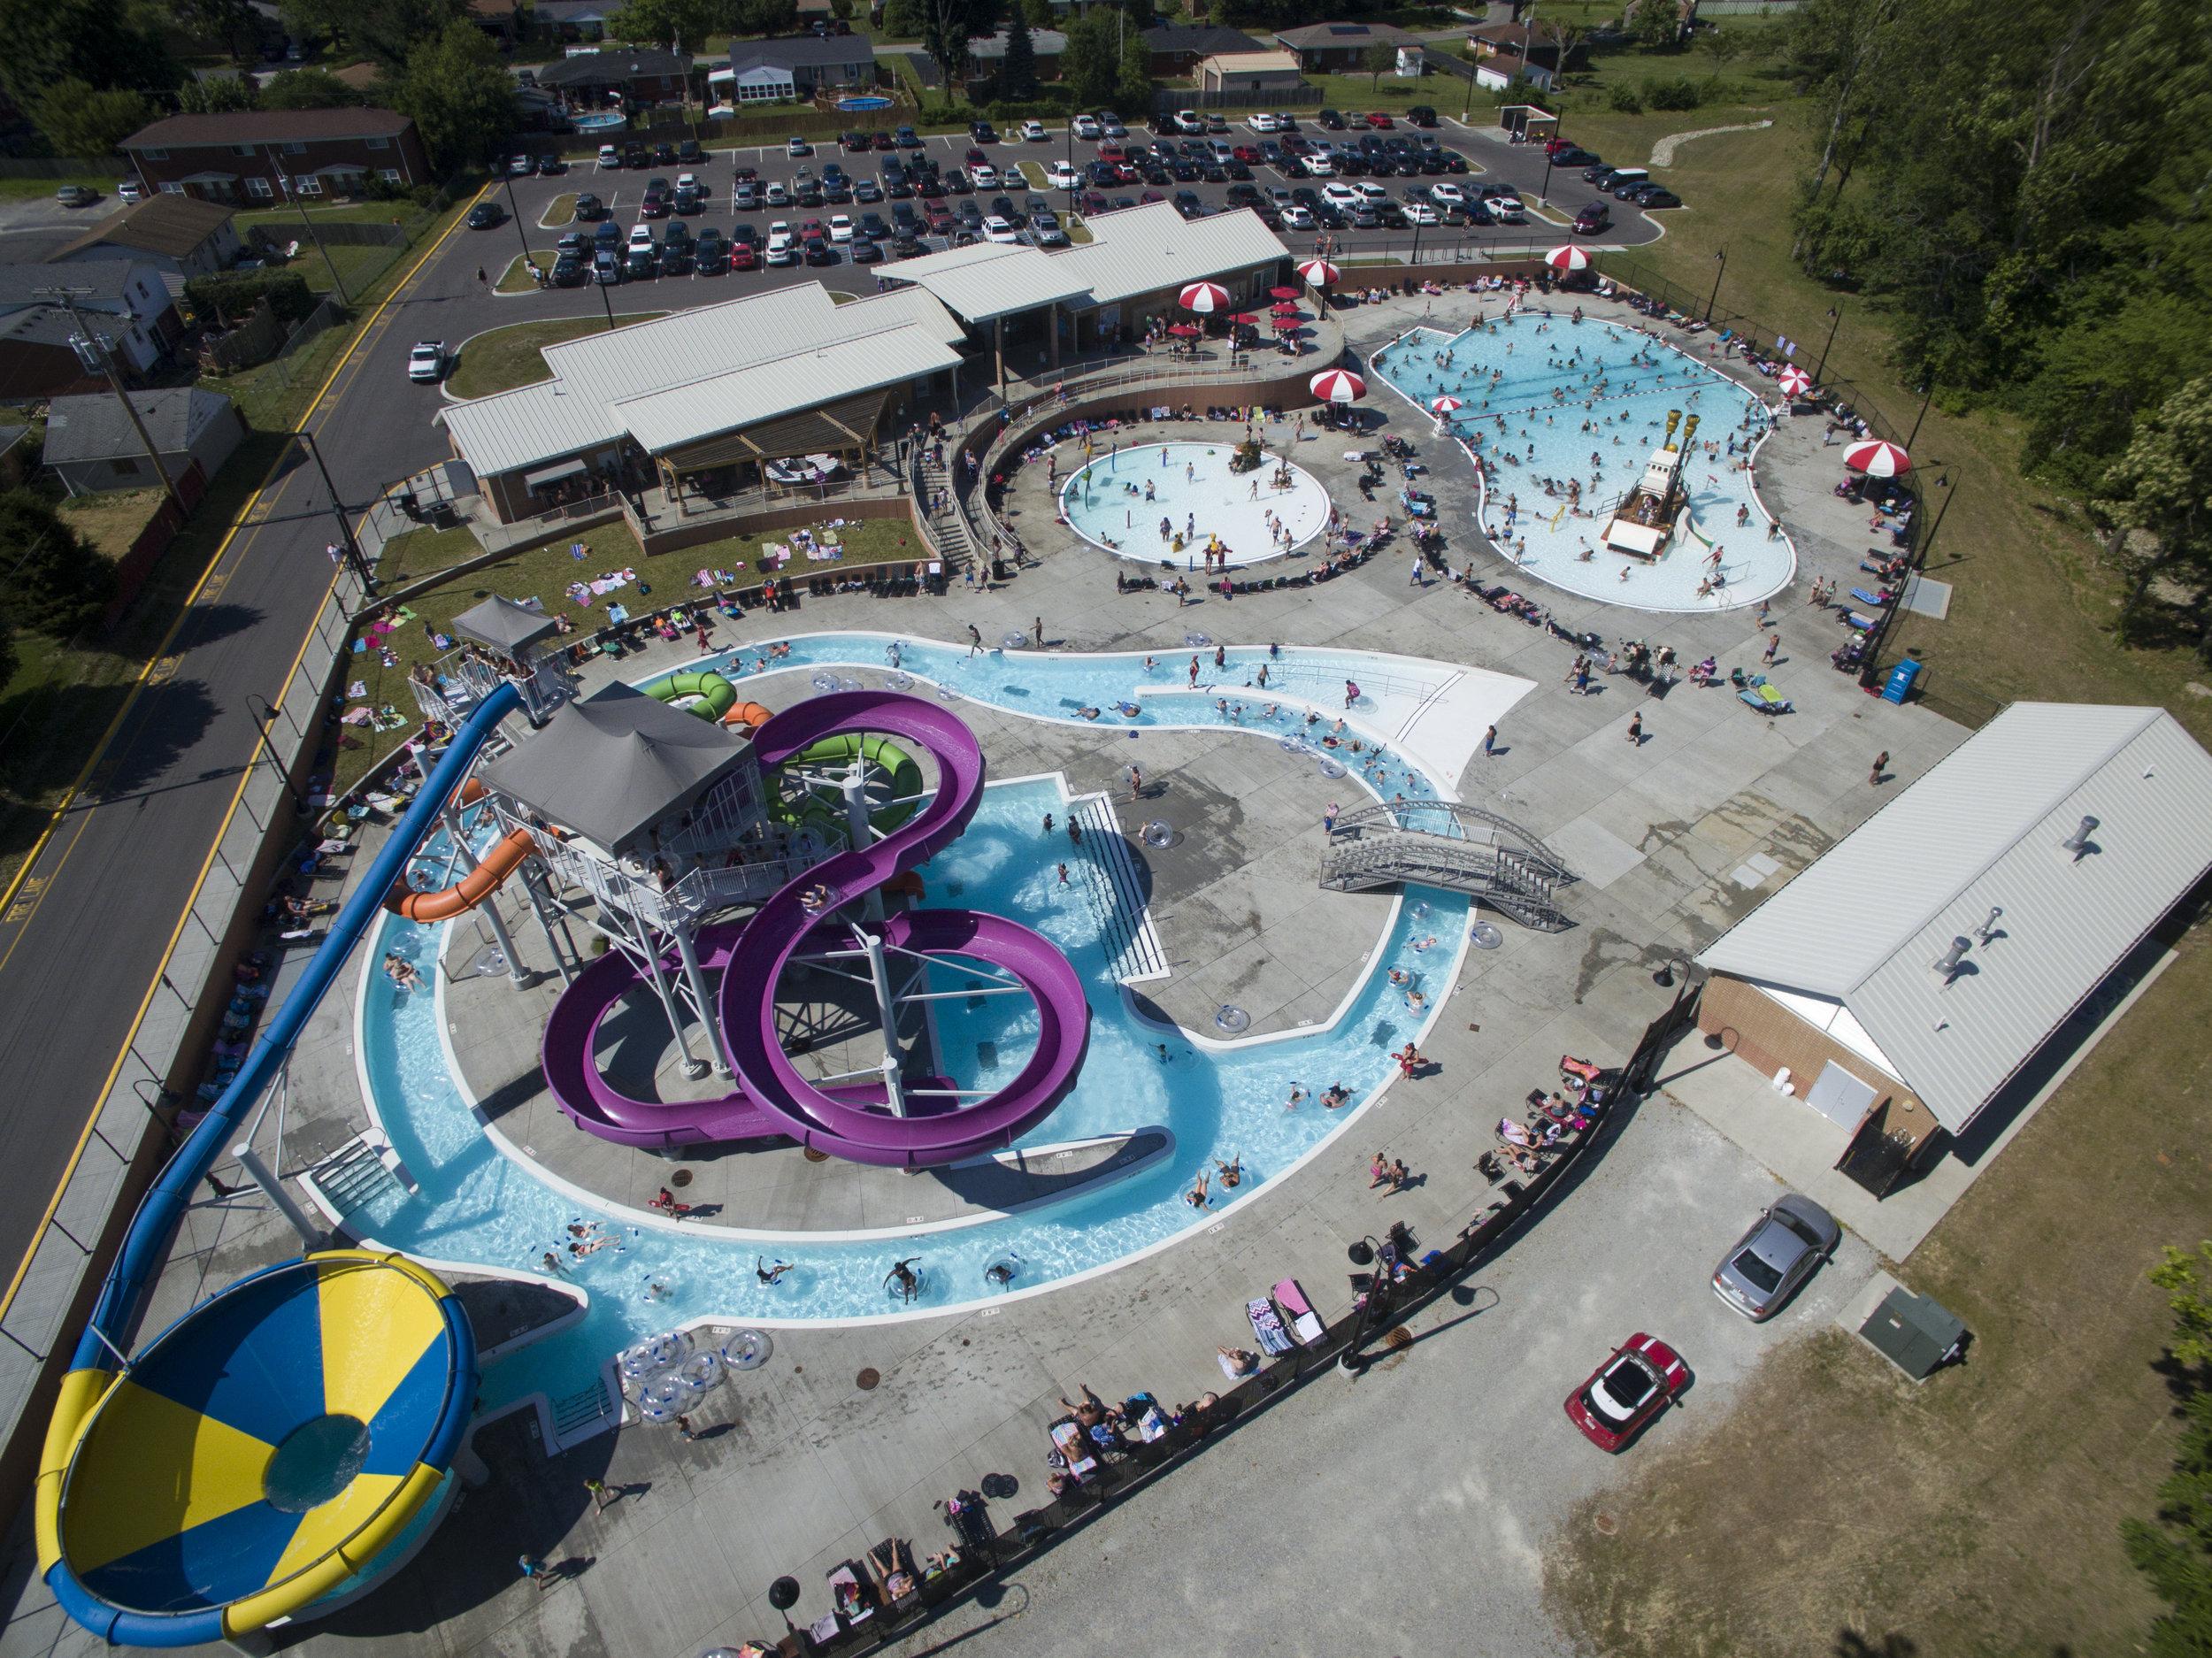 River Run Family Waterpark June 11 2016.JPG